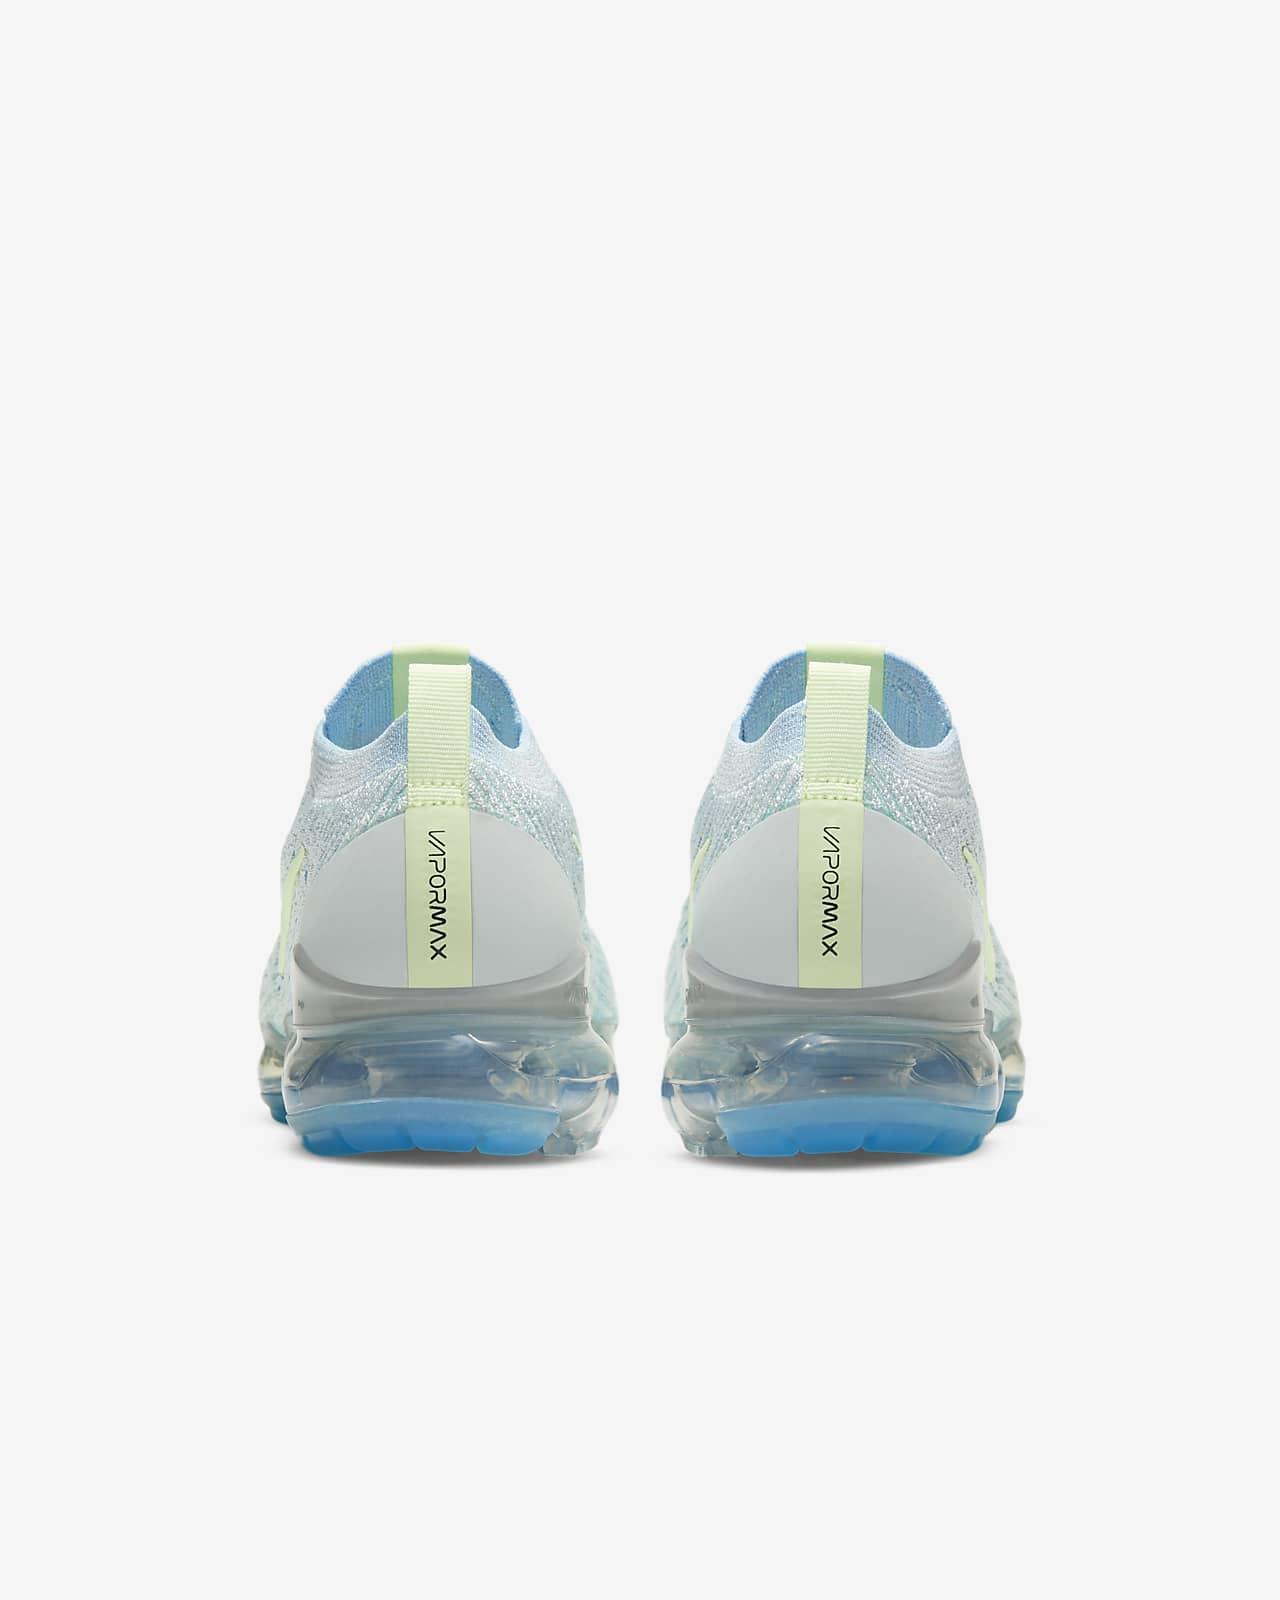 vapormax flyknit ice blue